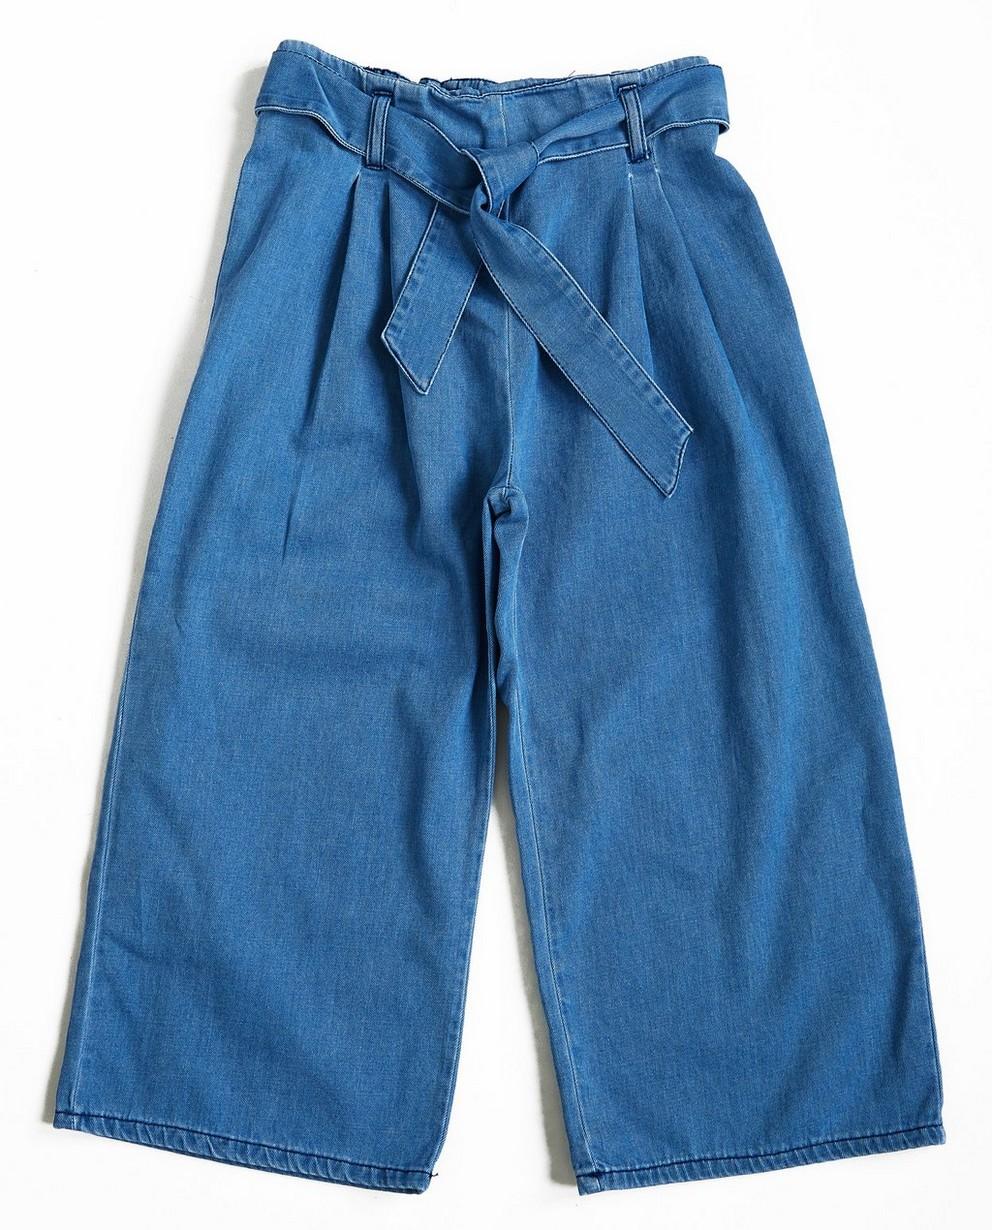 Damen Jeans Culotte Hose Hosenrock weites Bein High Waist Urban Classics TB2367